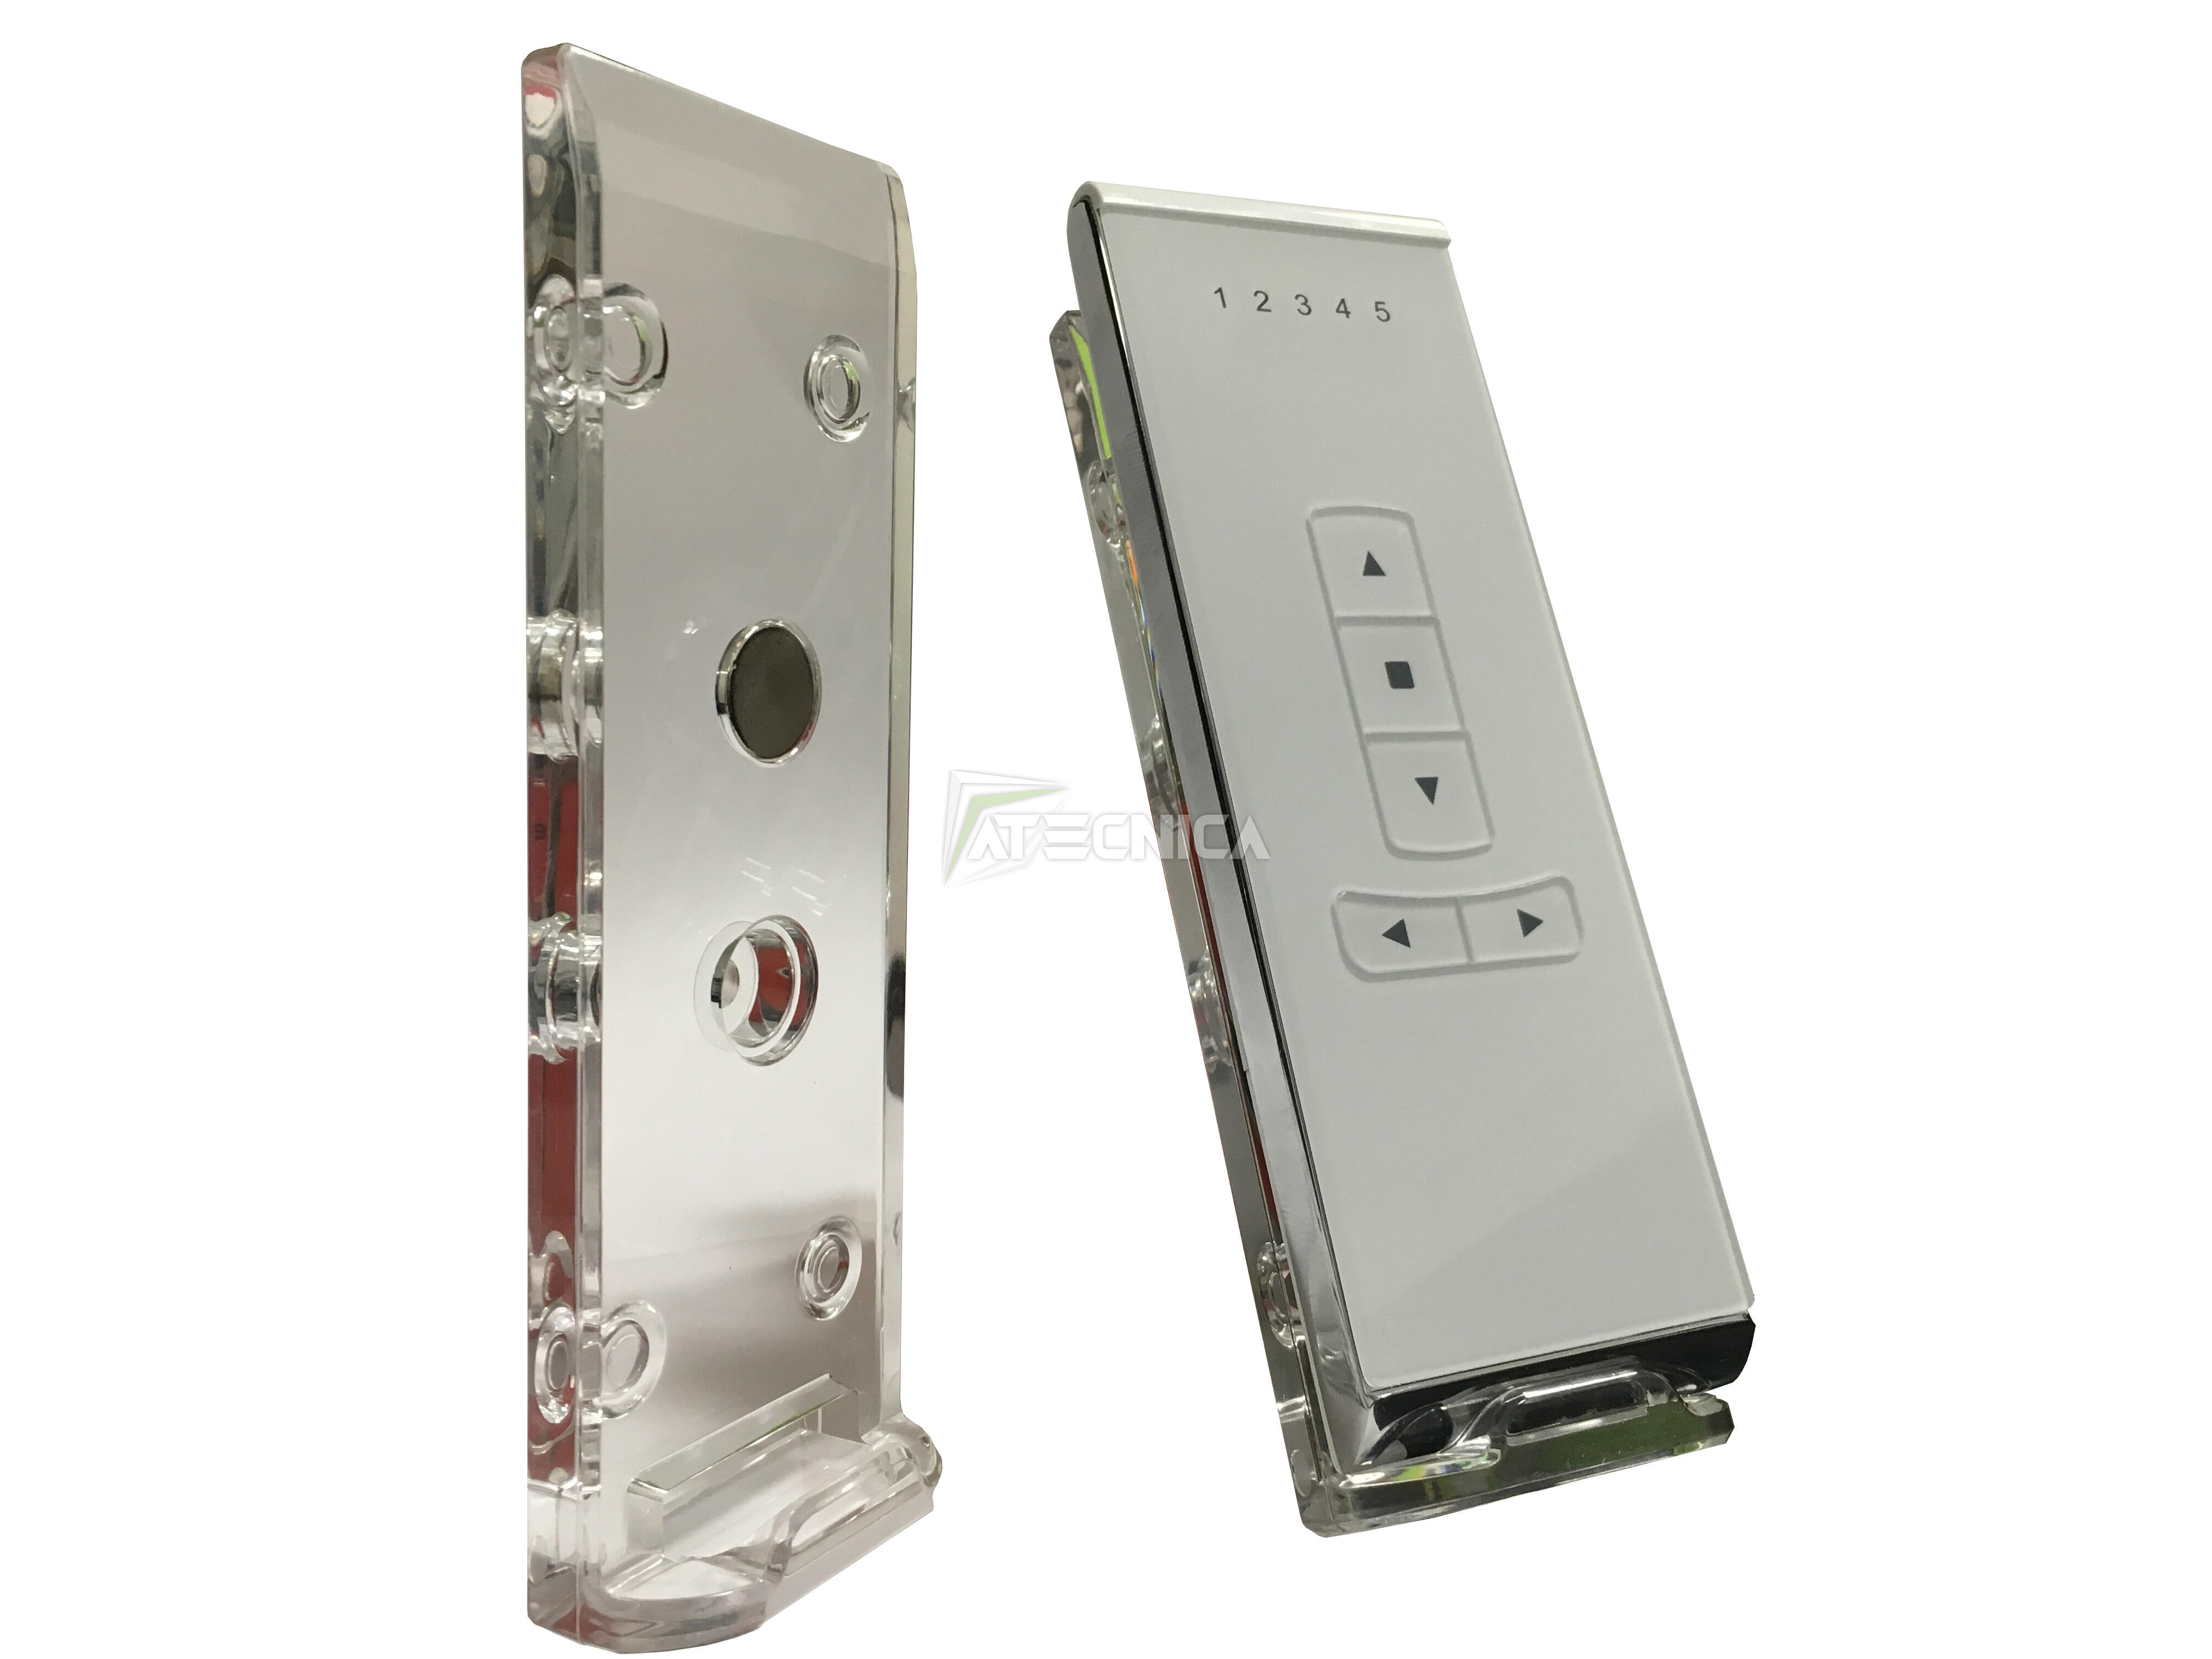 remote control transmitter remote control shutter curtains. Black Bedroom Furniture Sets. Home Design Ideas